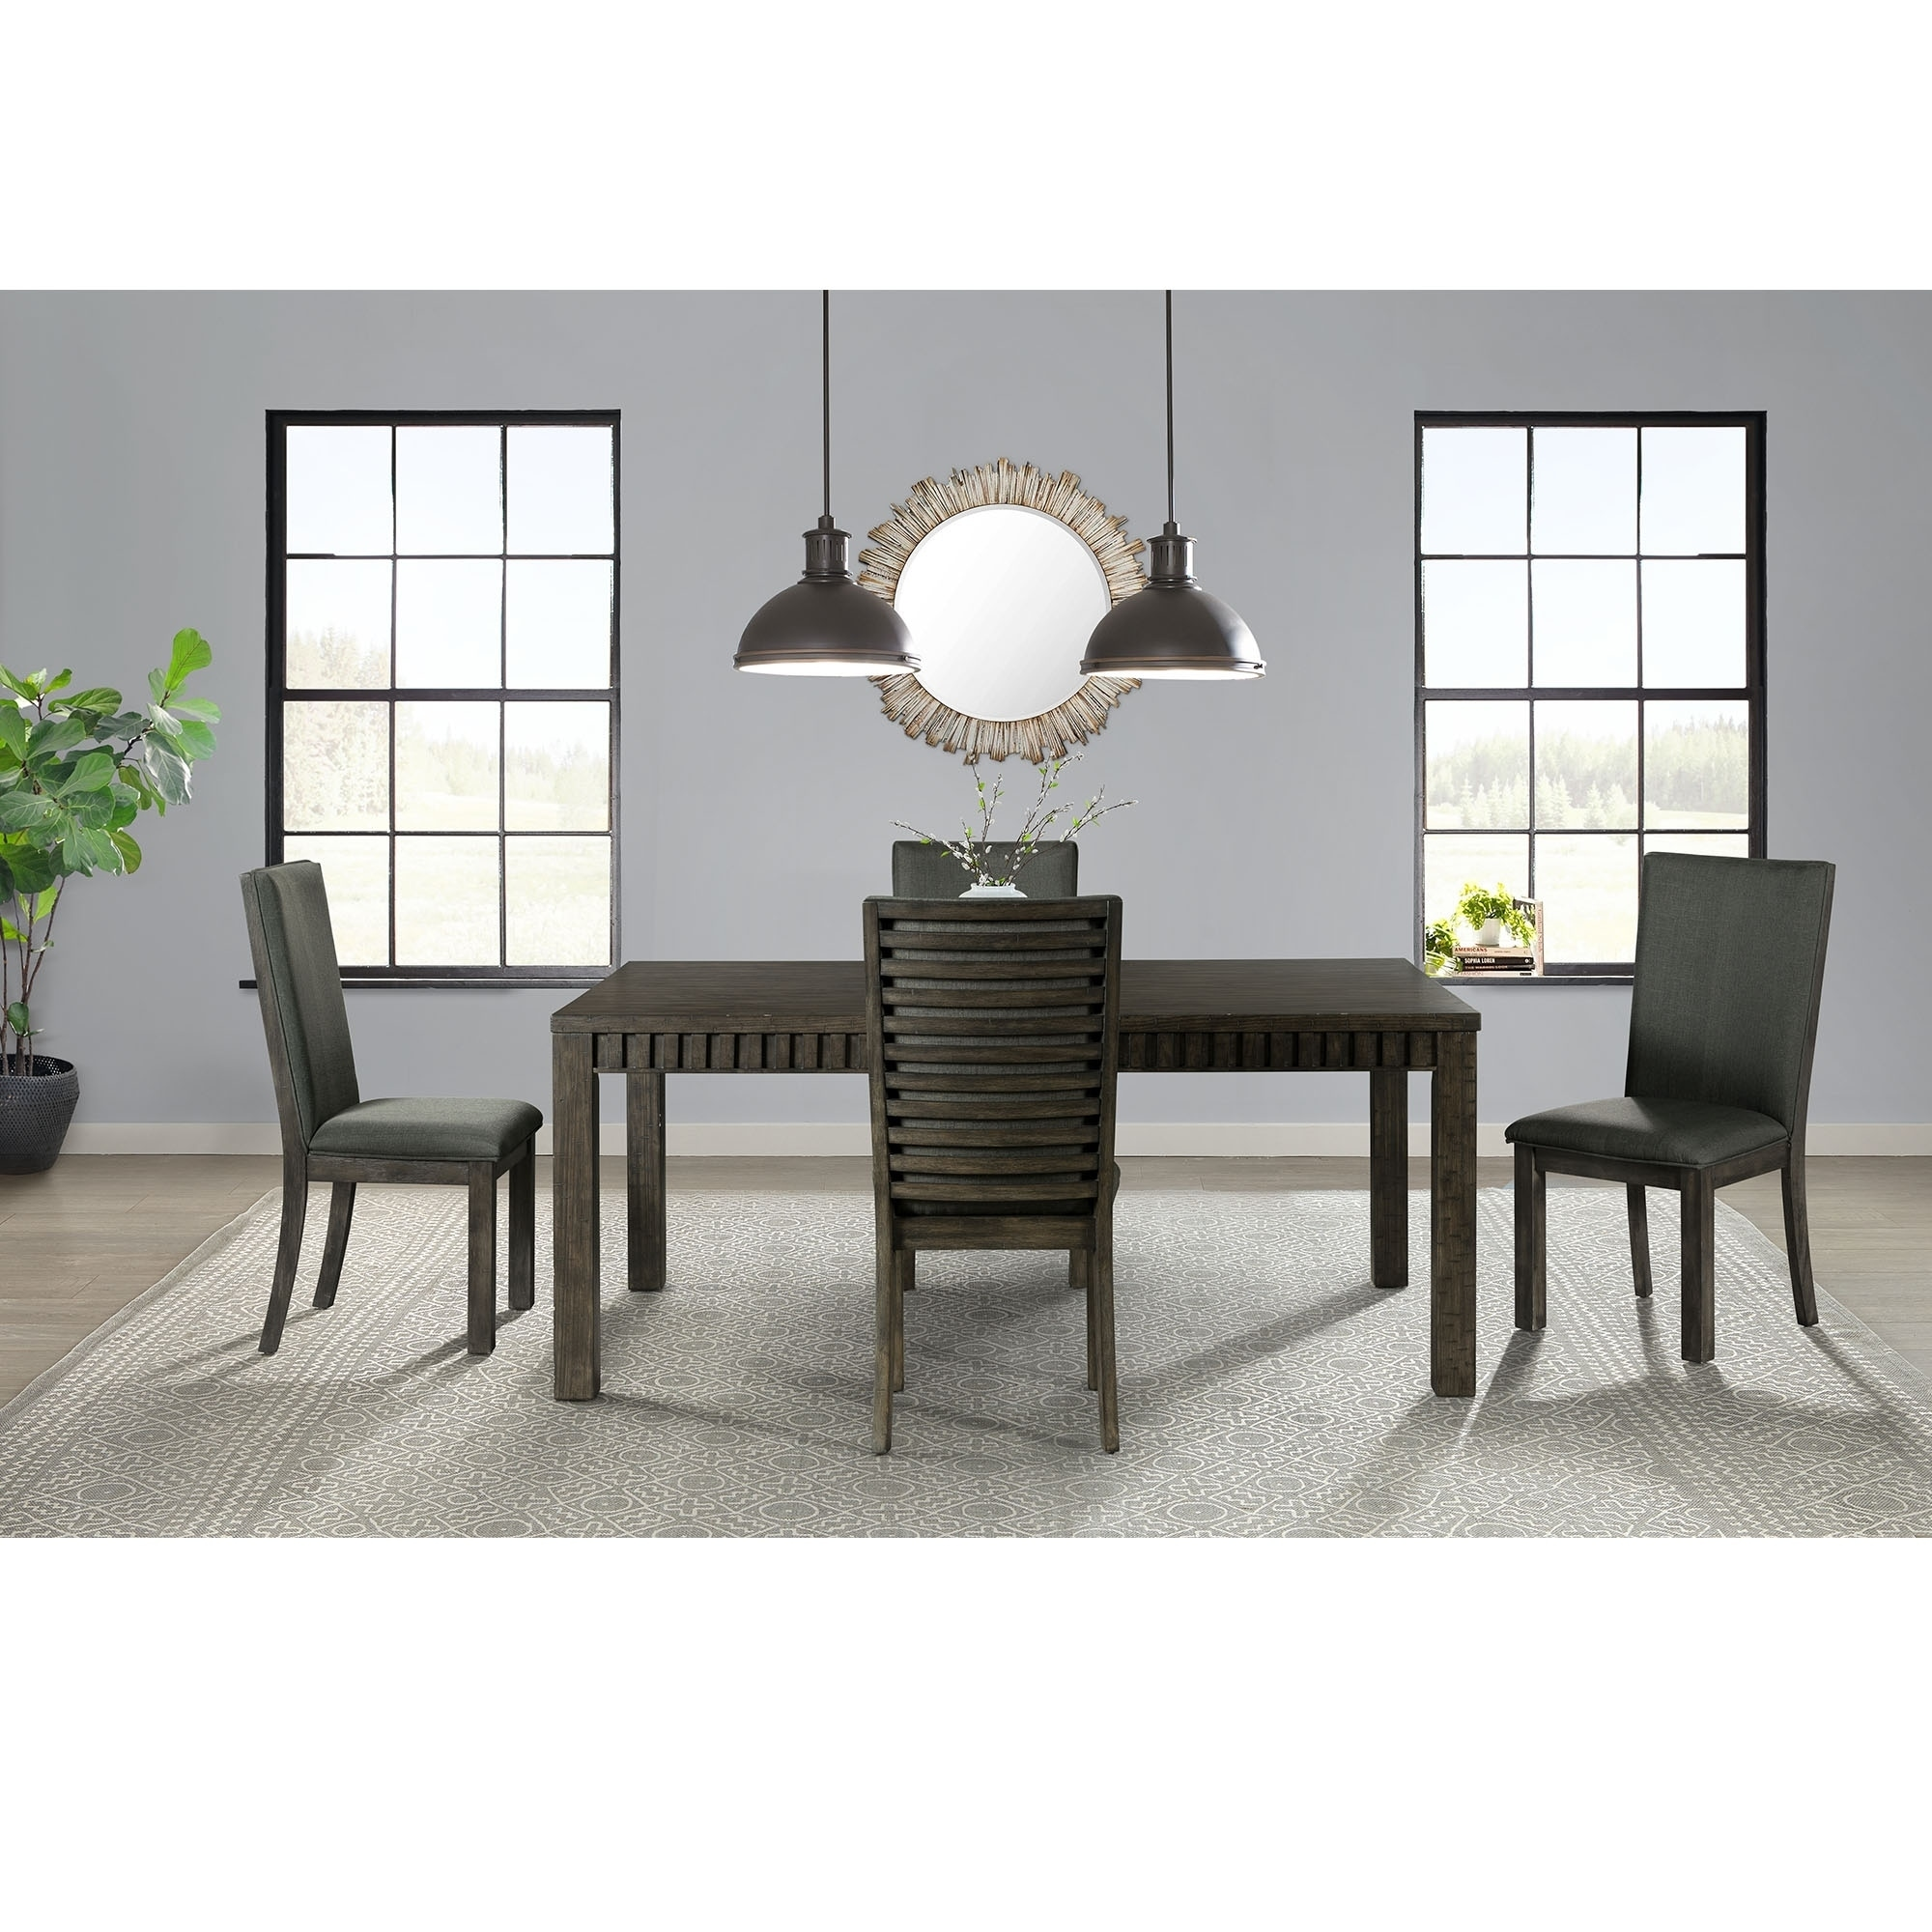 5pc Dining Set: Picket House Furnishings Montego 5PC Dining Set-Table